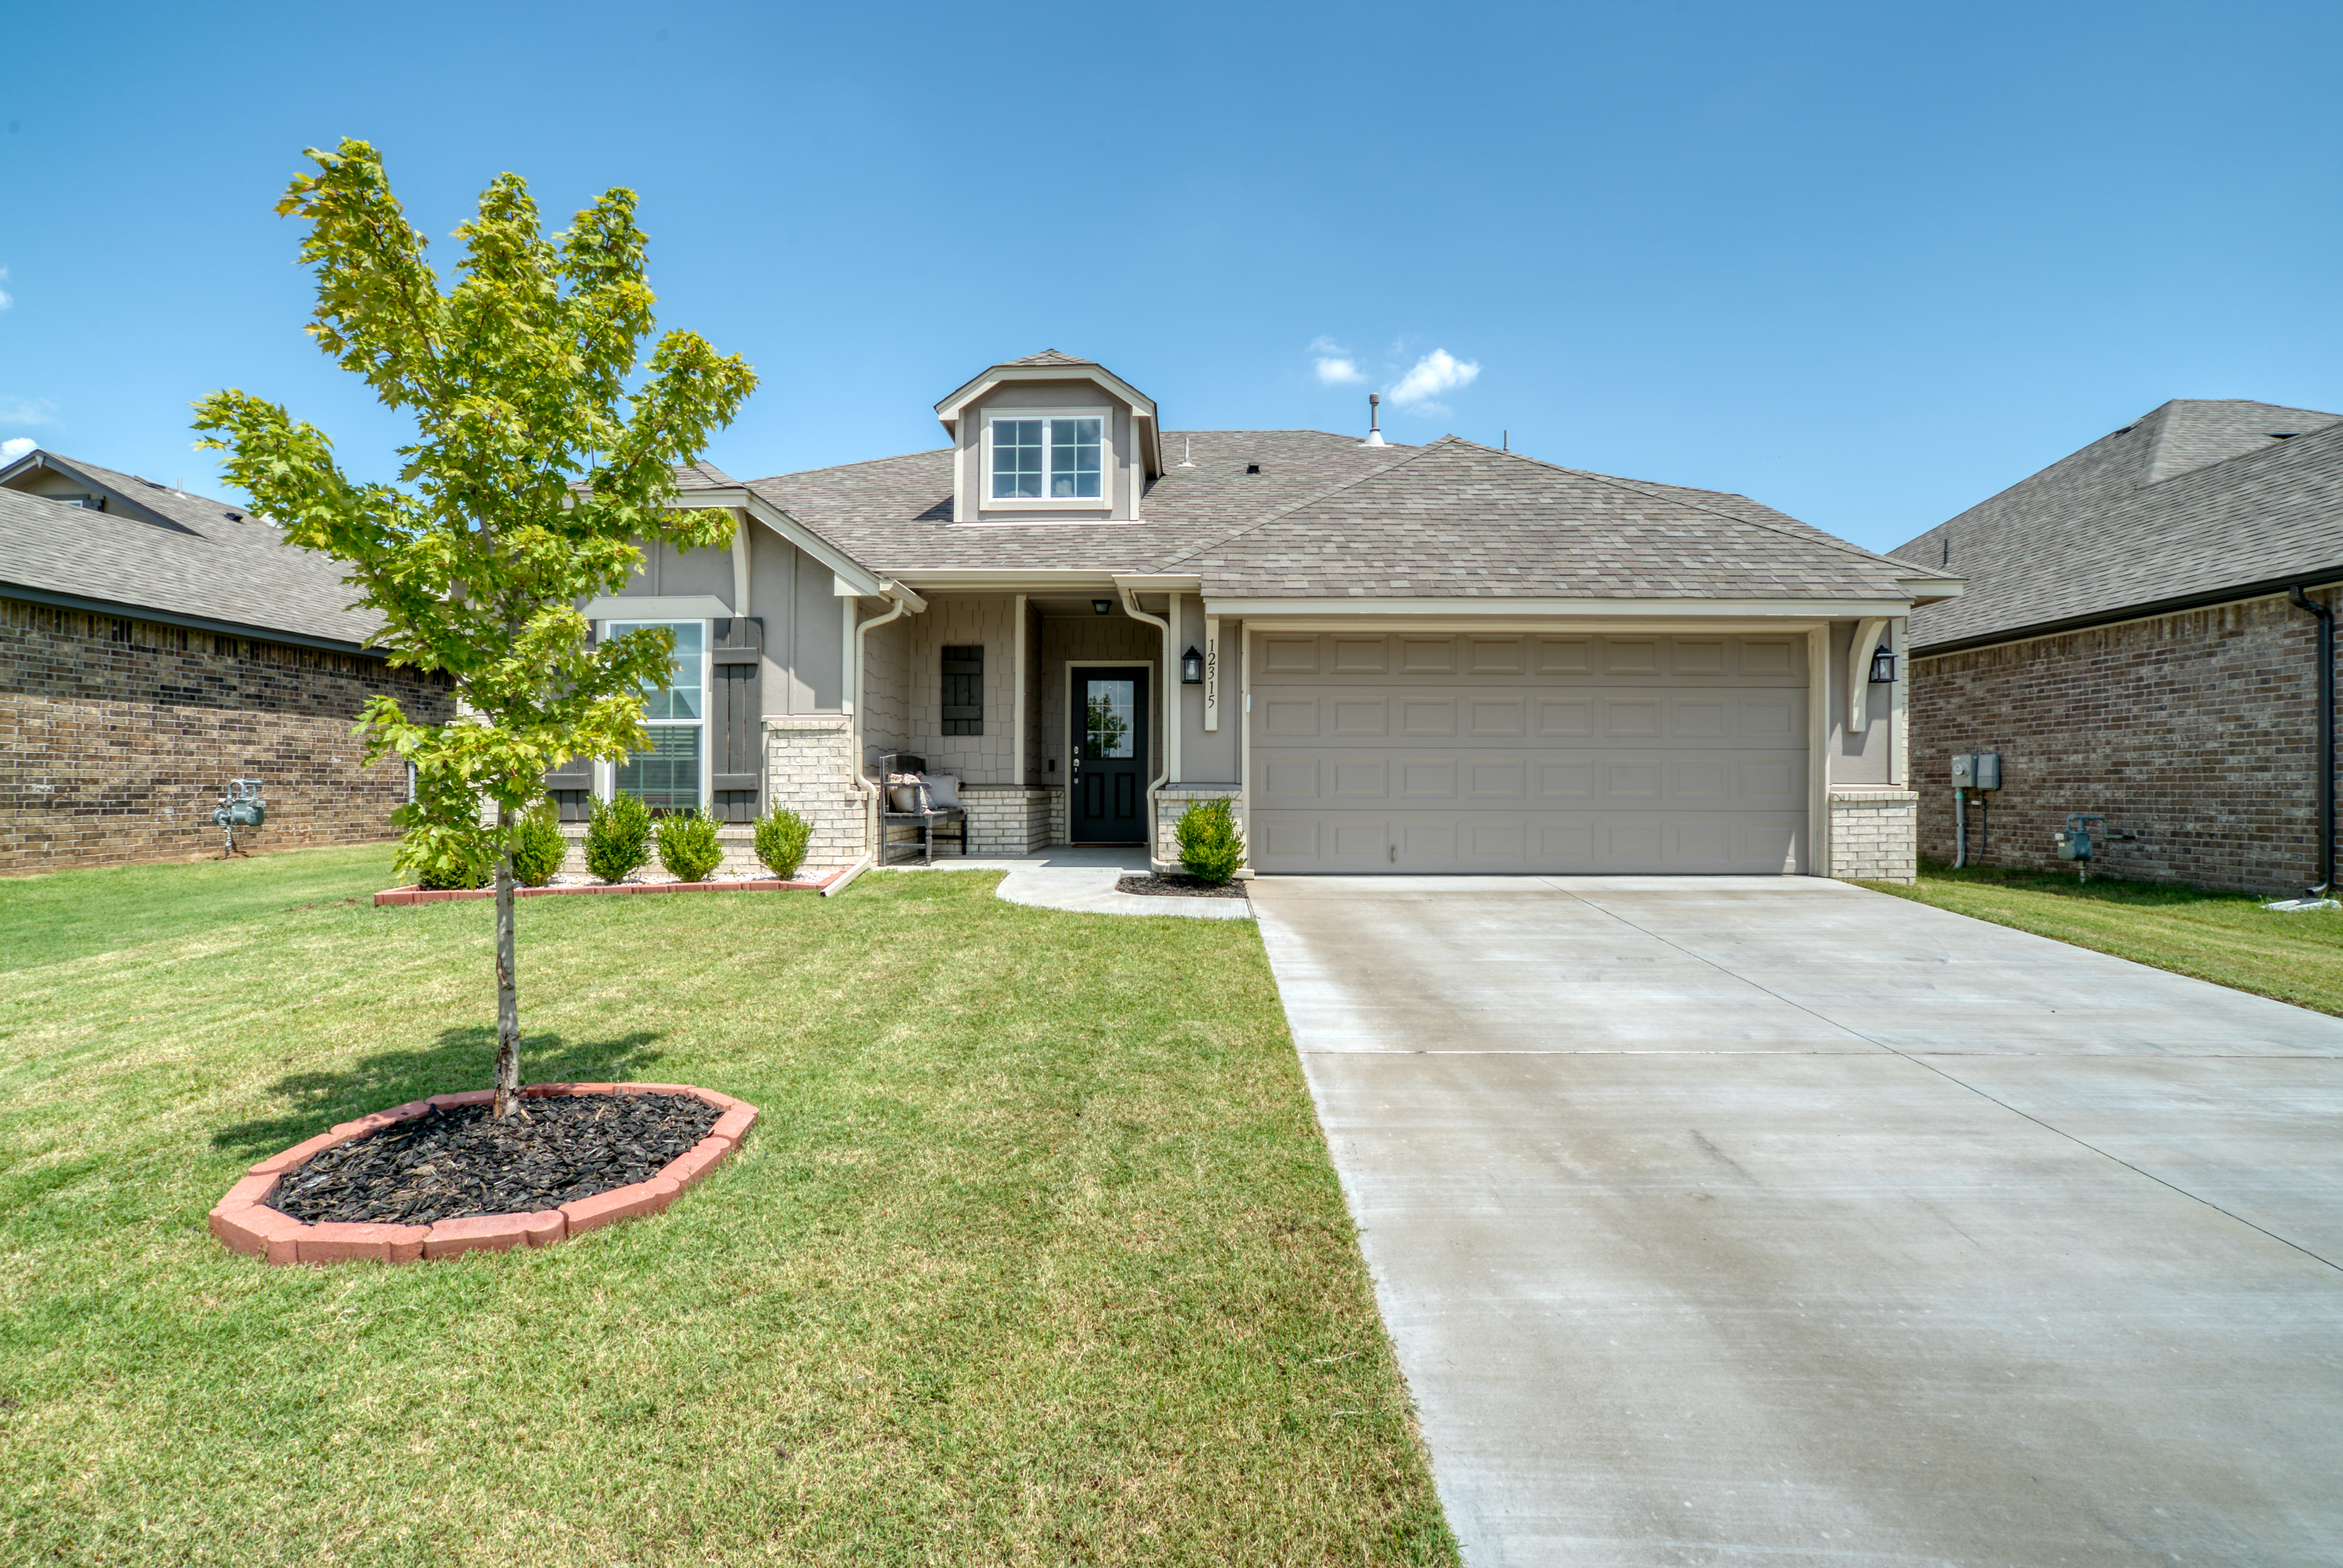 12315 N 131st East Avenue Property Photo 1